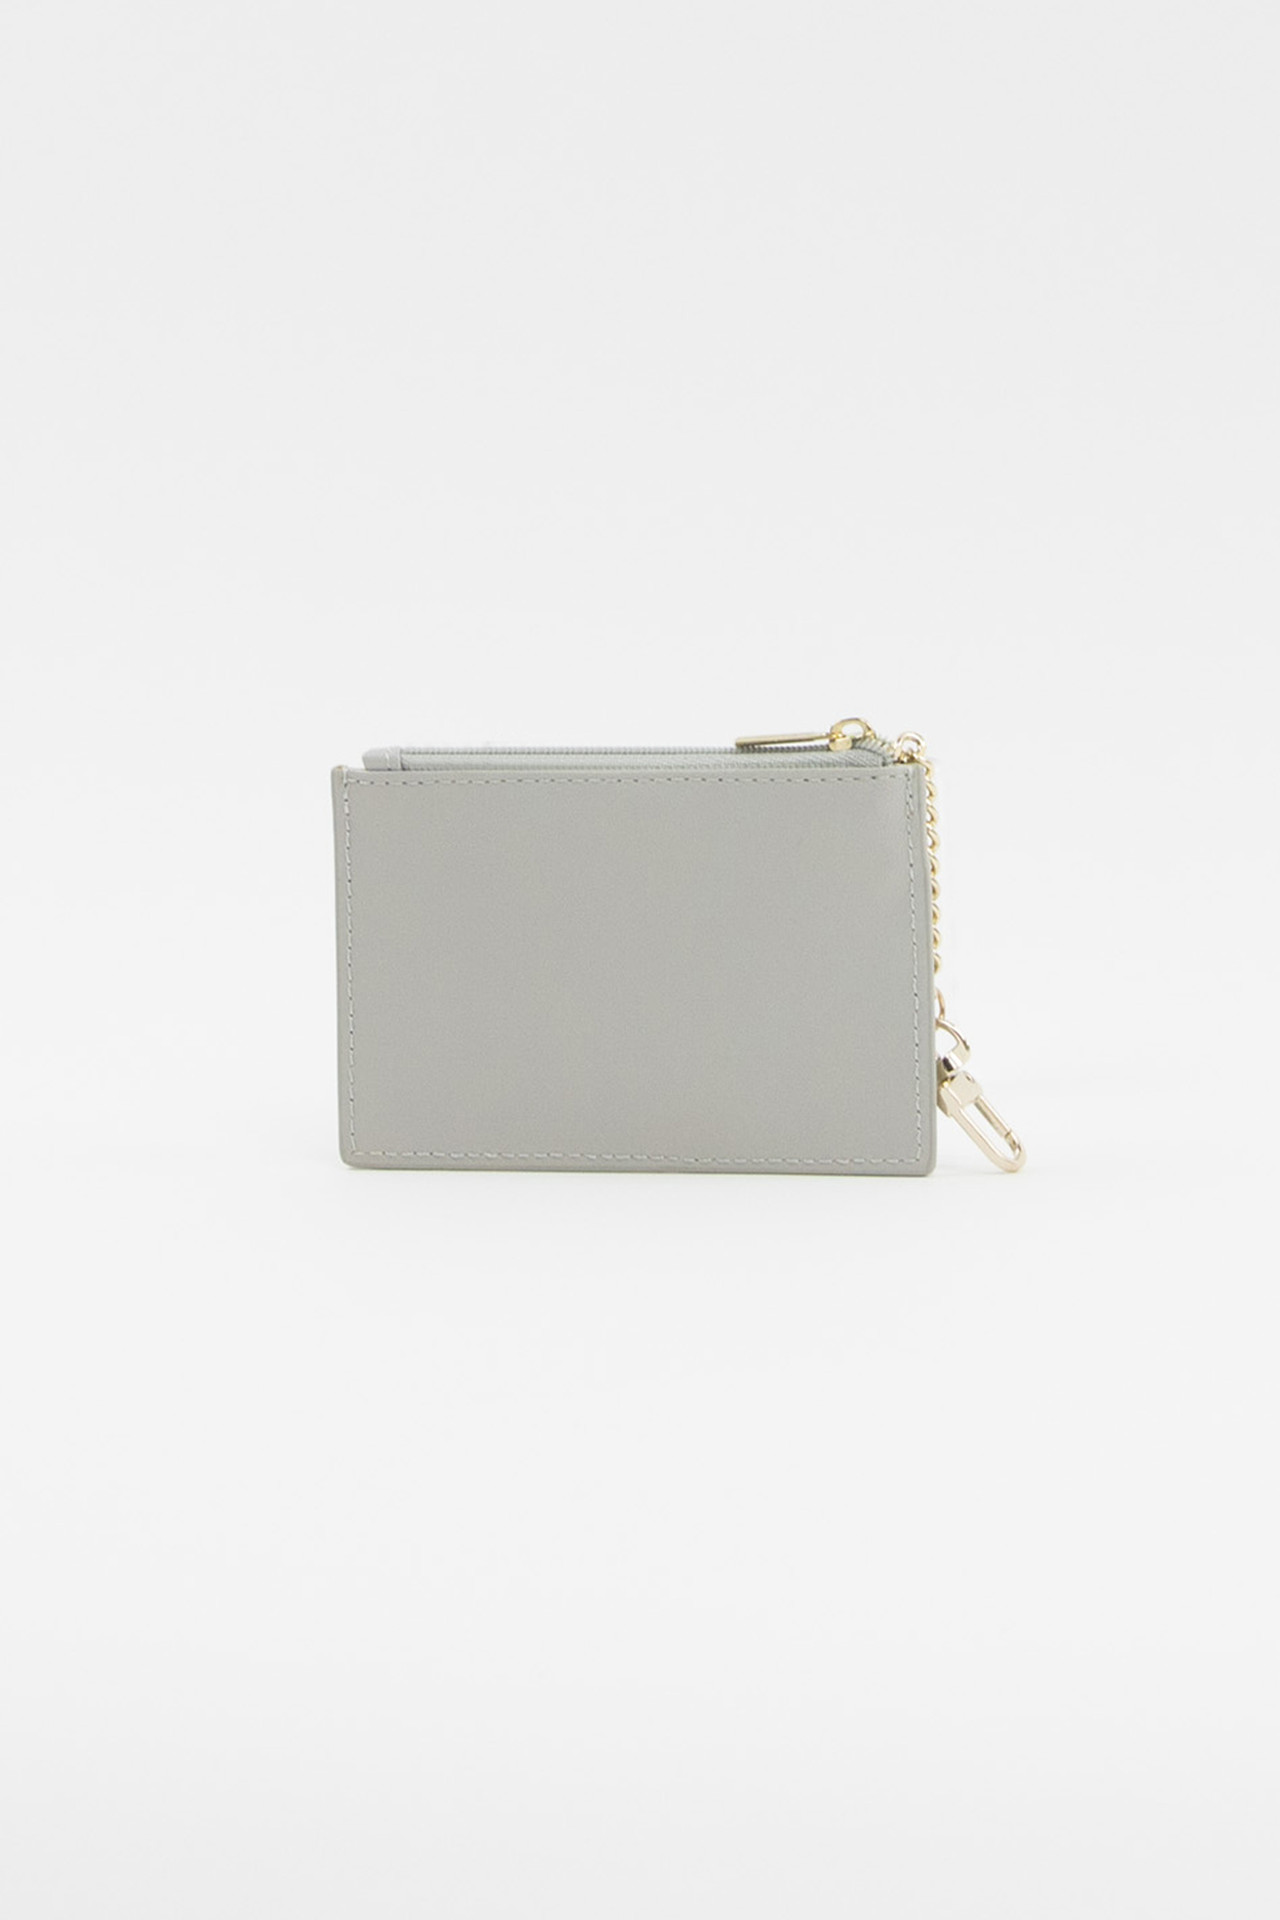 Light Gray Vegan Leather Credit Card Keychain